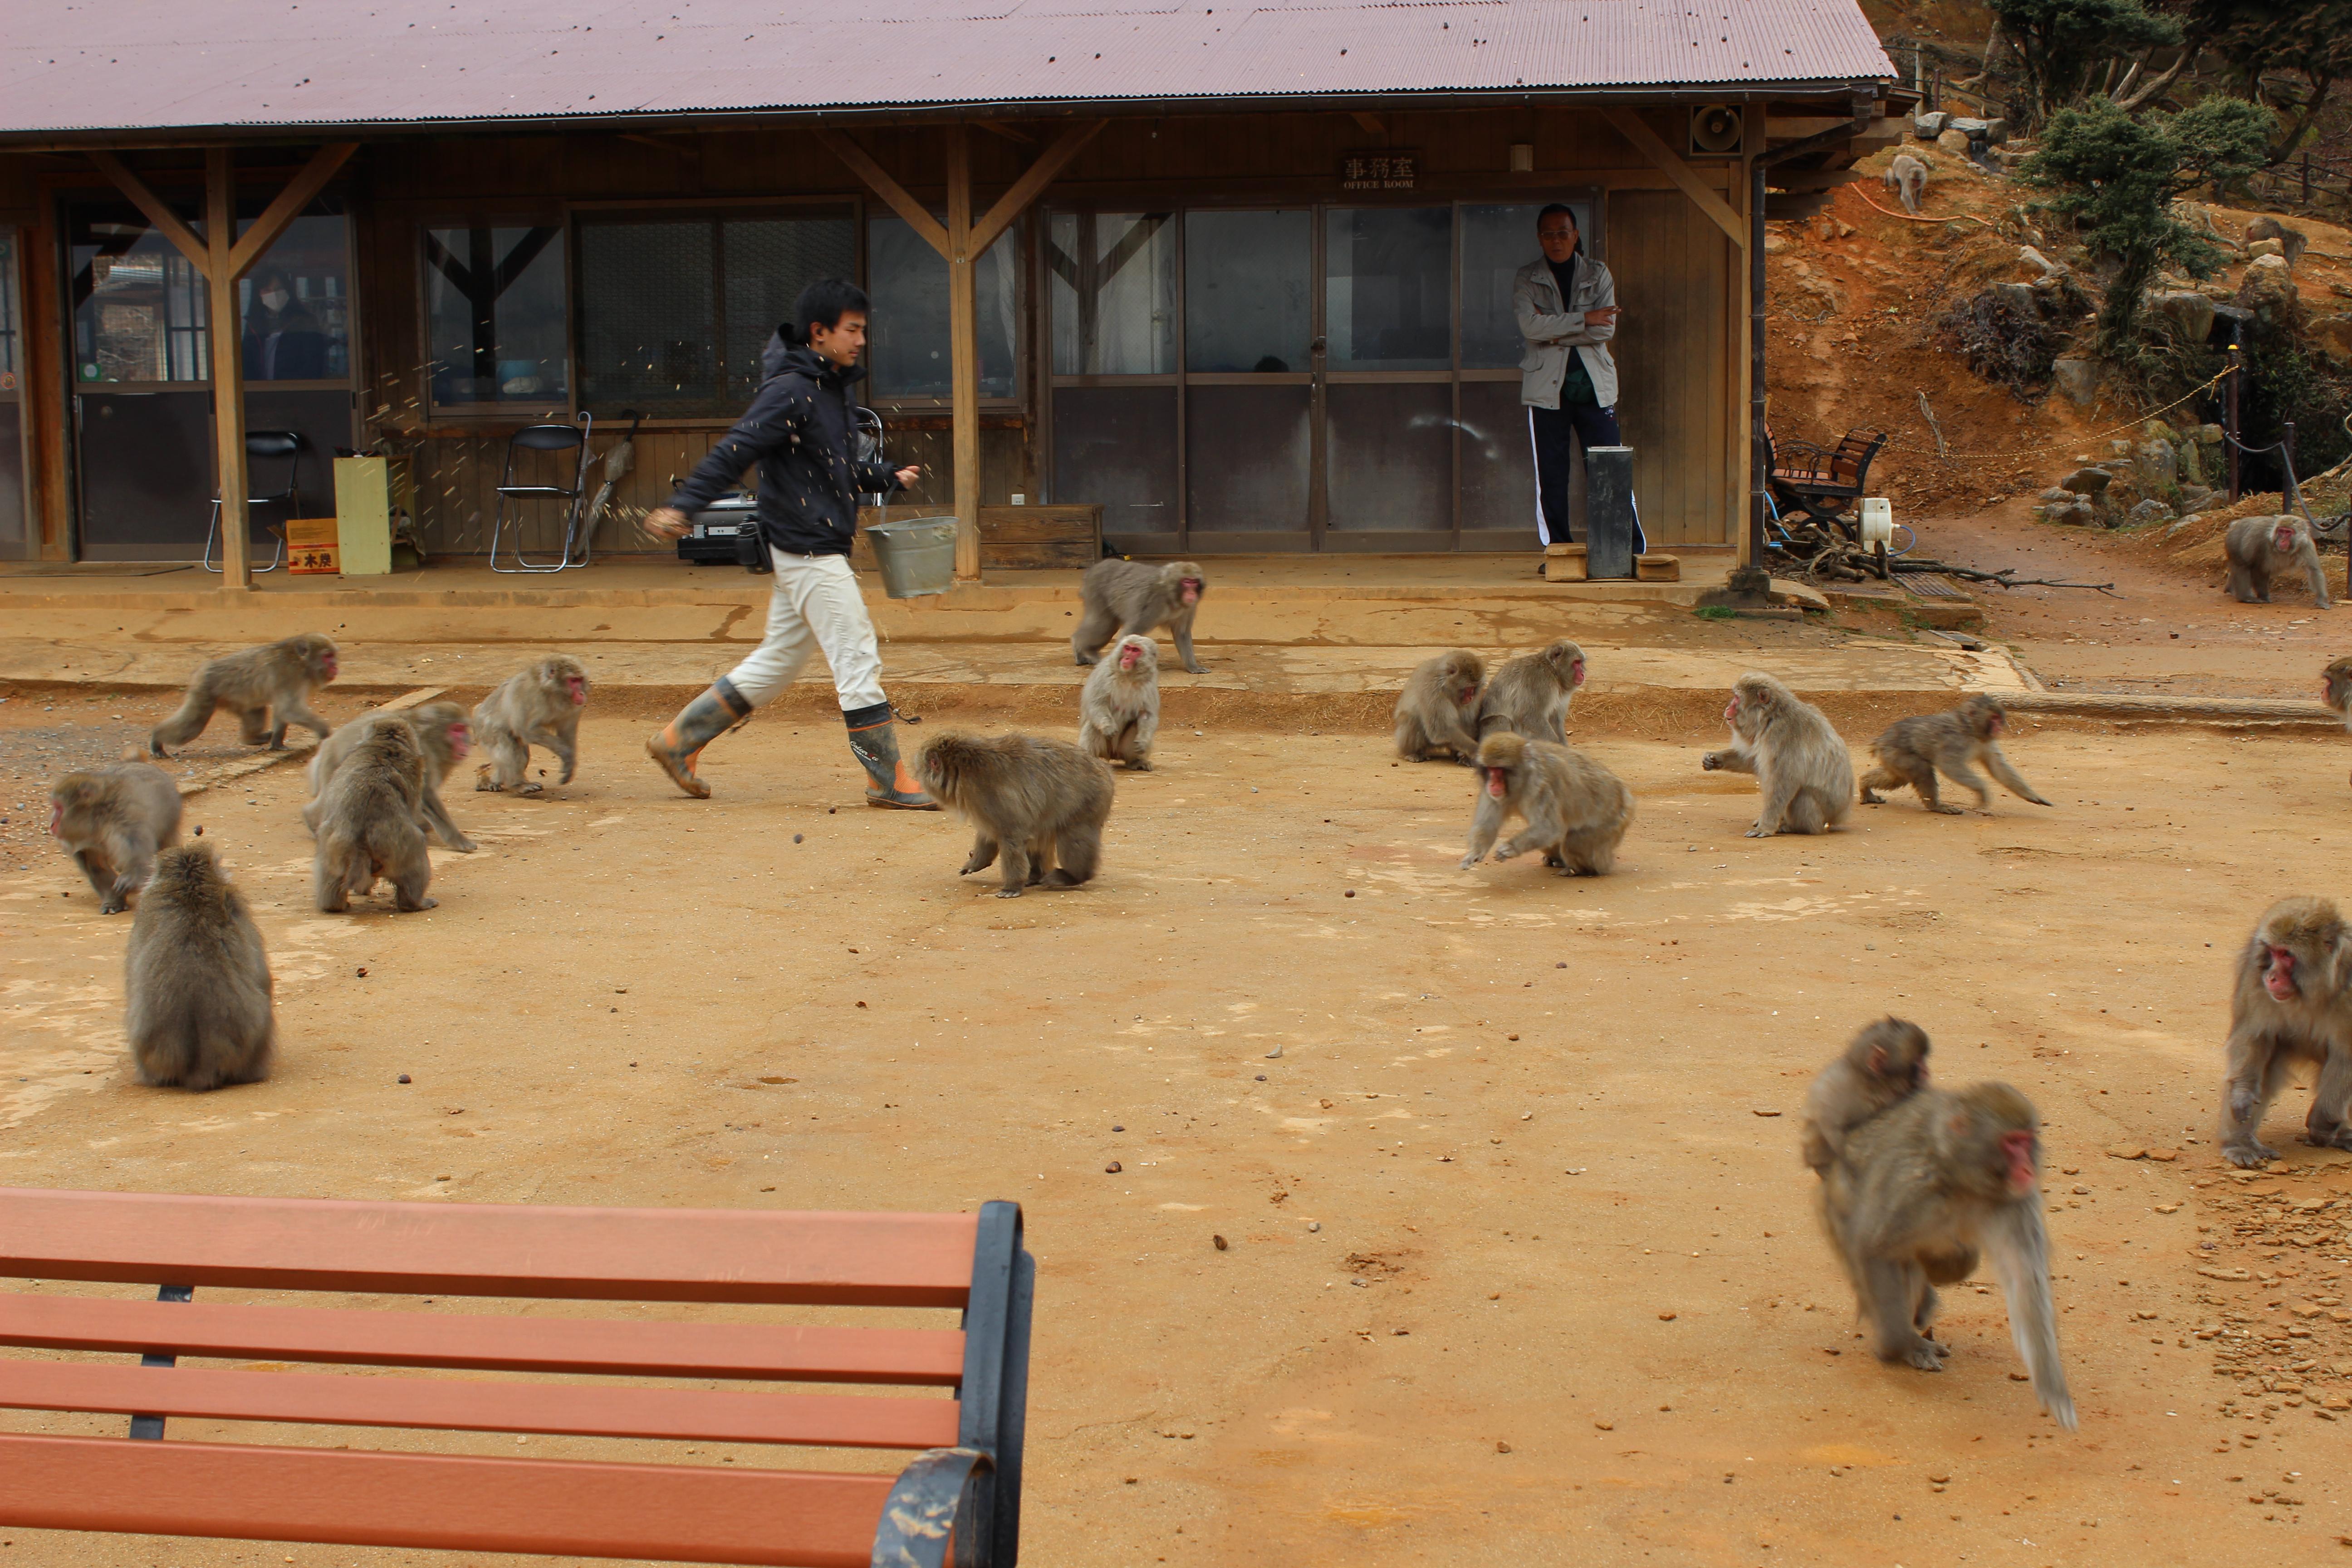 Monkey's getting fed